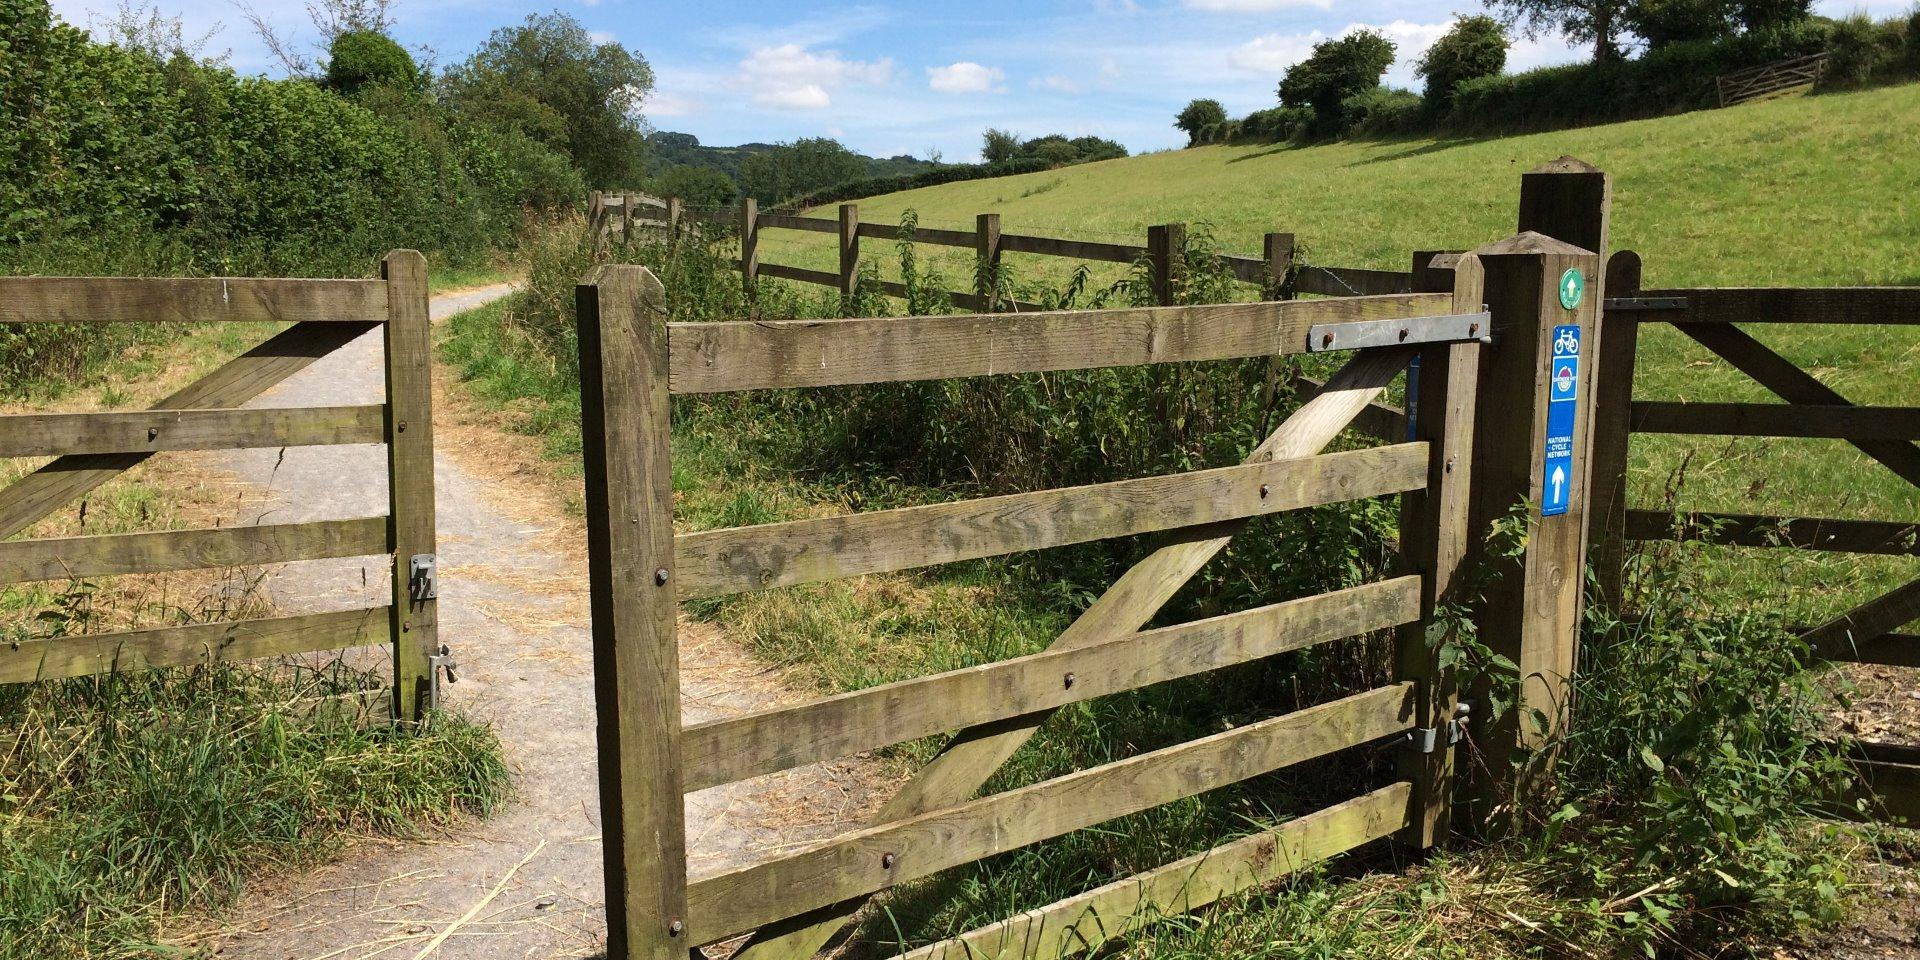 Start of the trail at Pound Lane, Moretonhampstead